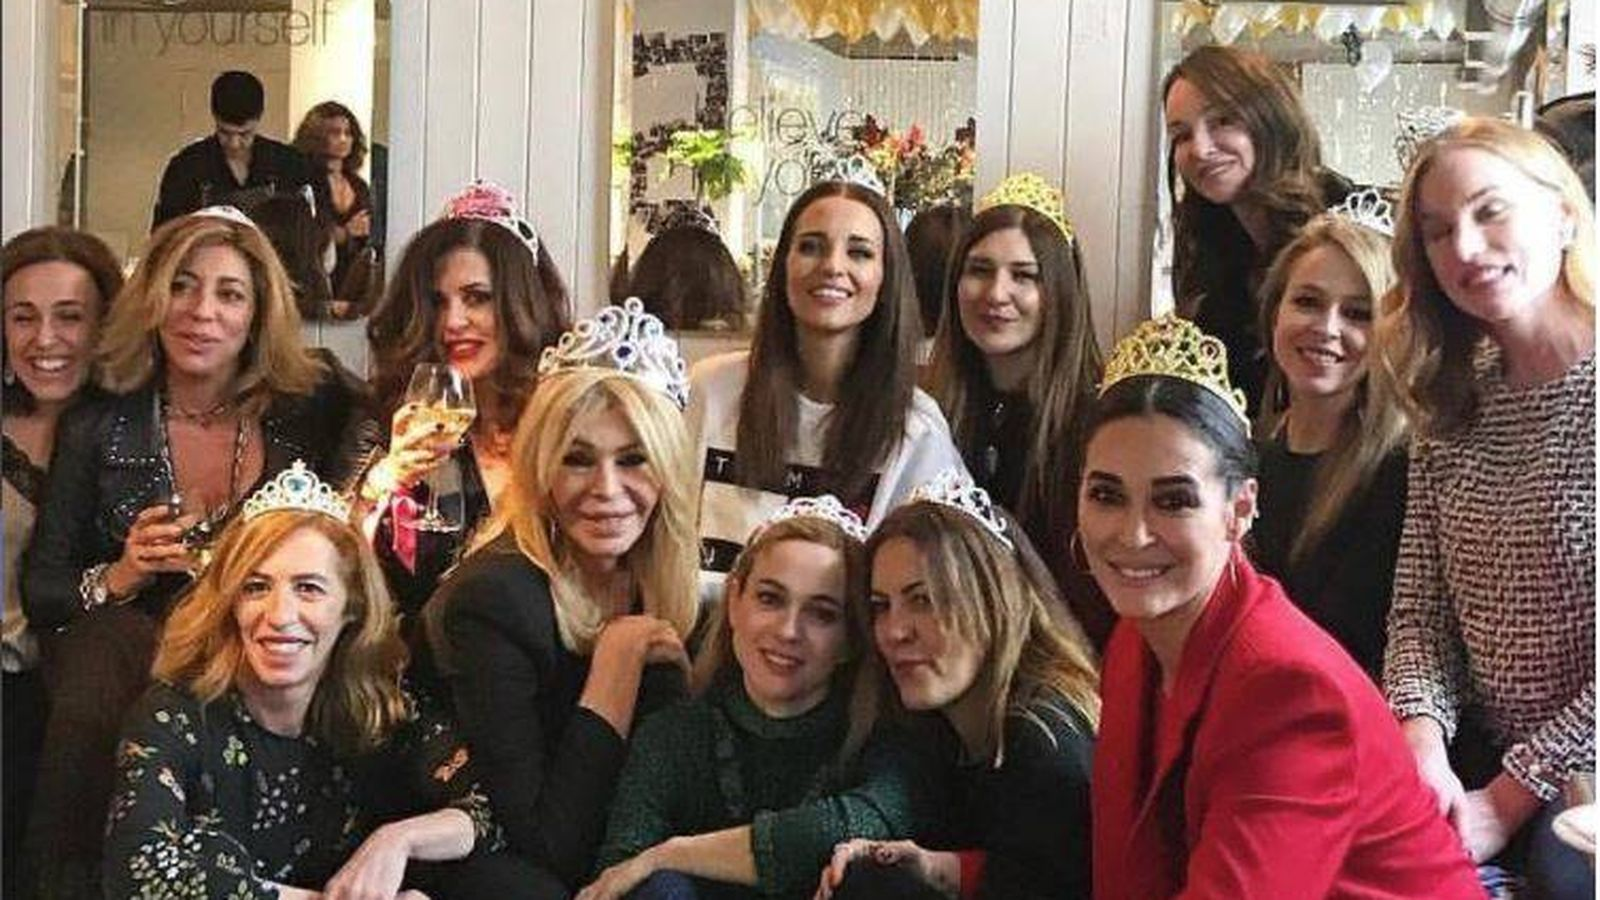 Foto: El fiestón de cumpleaños de Natalia de la Vega (Tacha Beauty). (Instagram Mª Eugenia León)